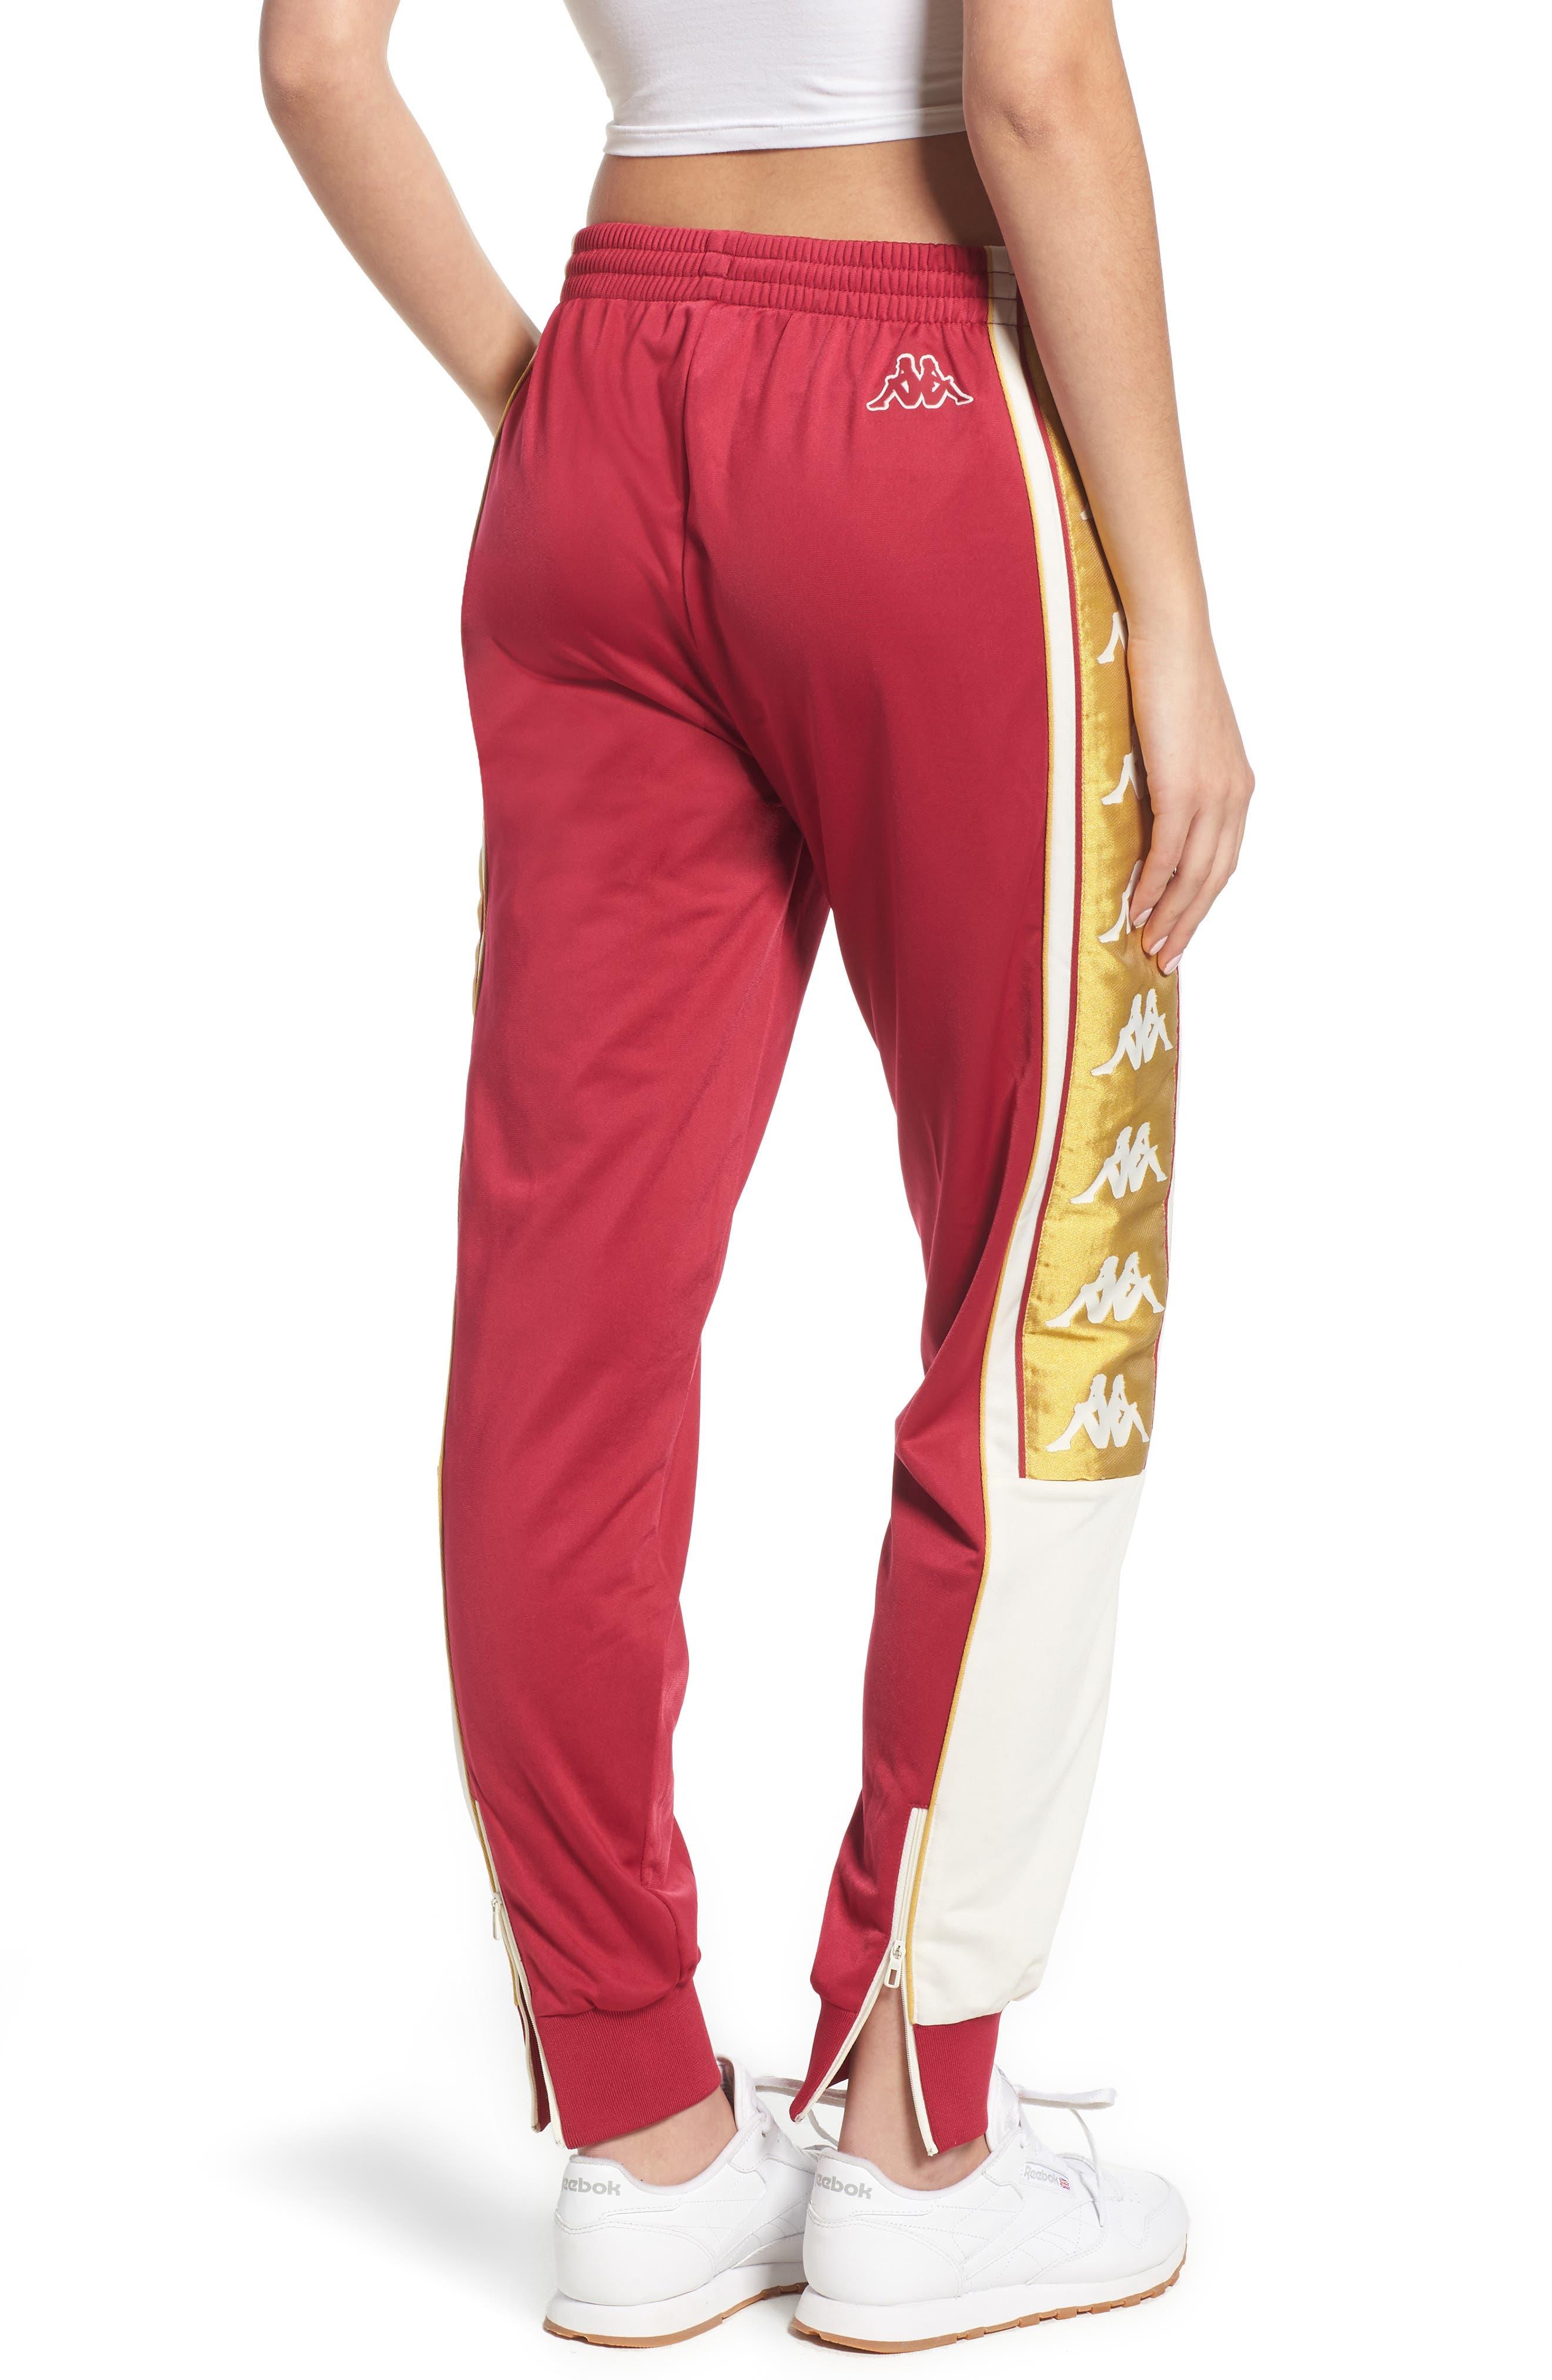 Track Pants,                             Alternate thumbnail 2, color,                             REDCERISE-WHITE-GOLD